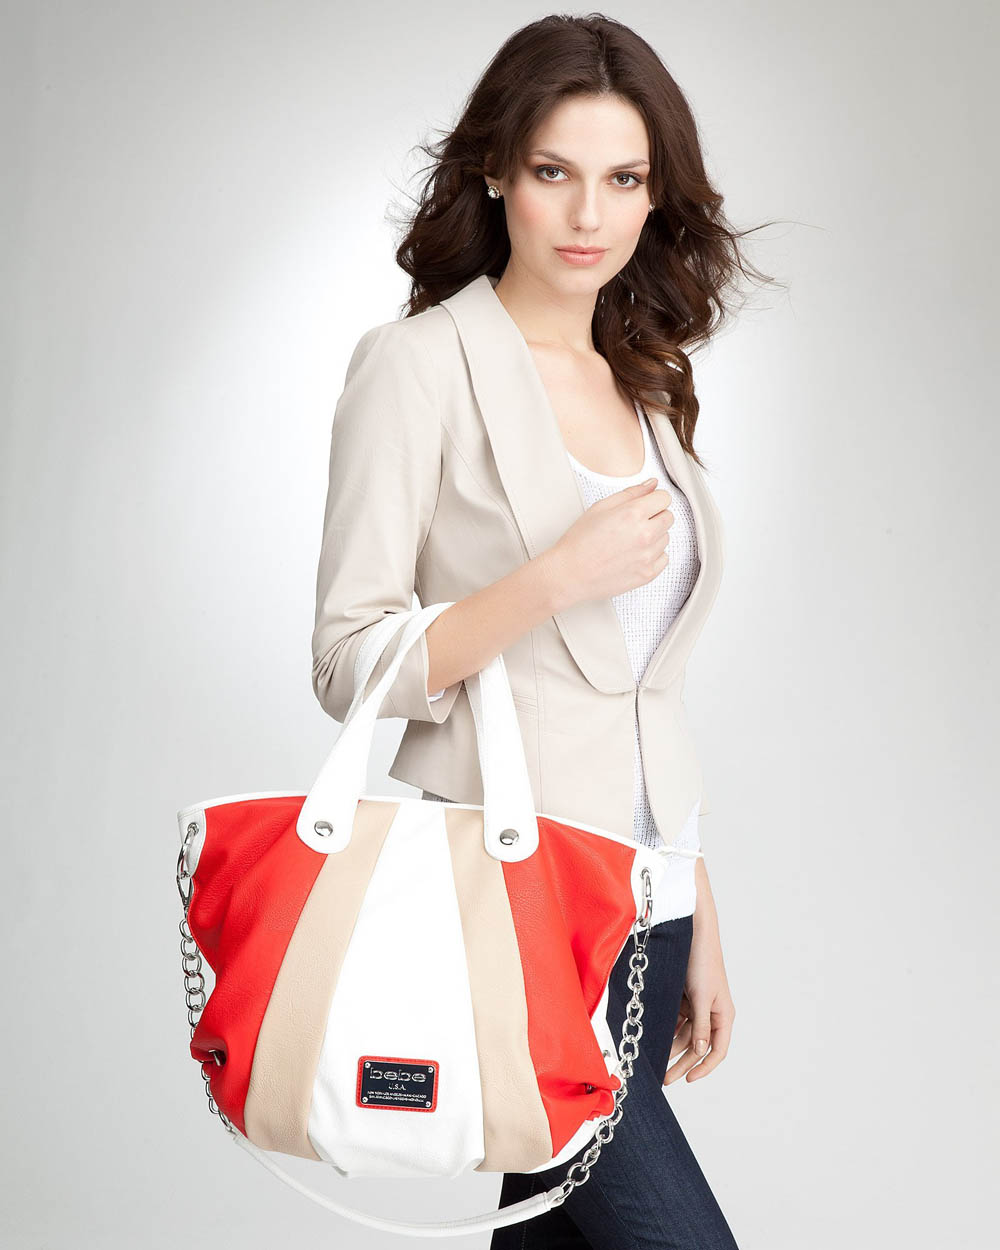 jenis macam koleksi produk fashion wanita cewek perempuan modis gaya fashionable trendy kece kekinian ngehits model baju pakaian sepatu jaket terbaru terkini ukuran bahan tas